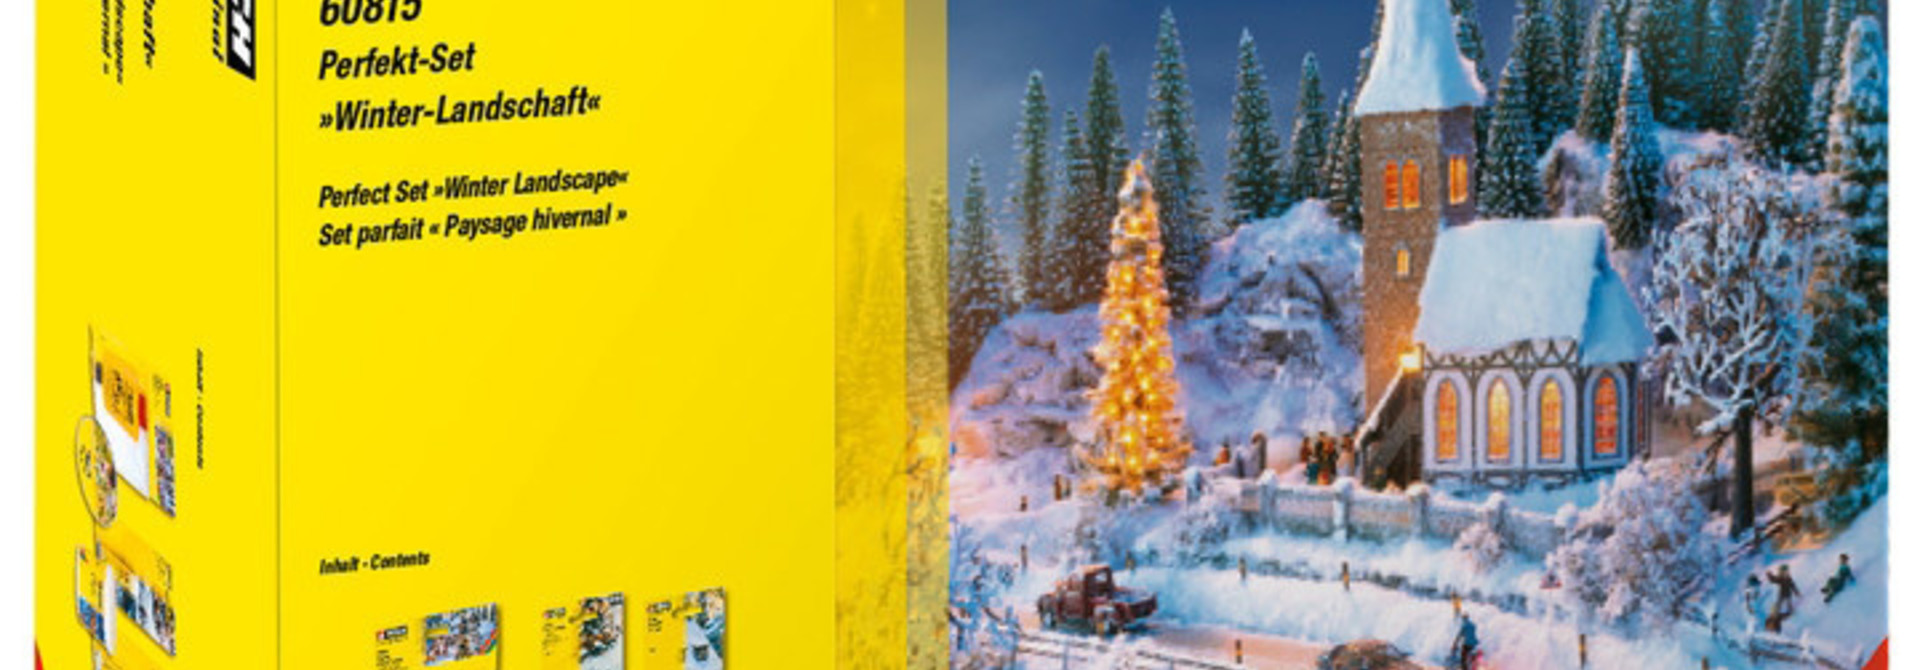 60815 Start-set winter